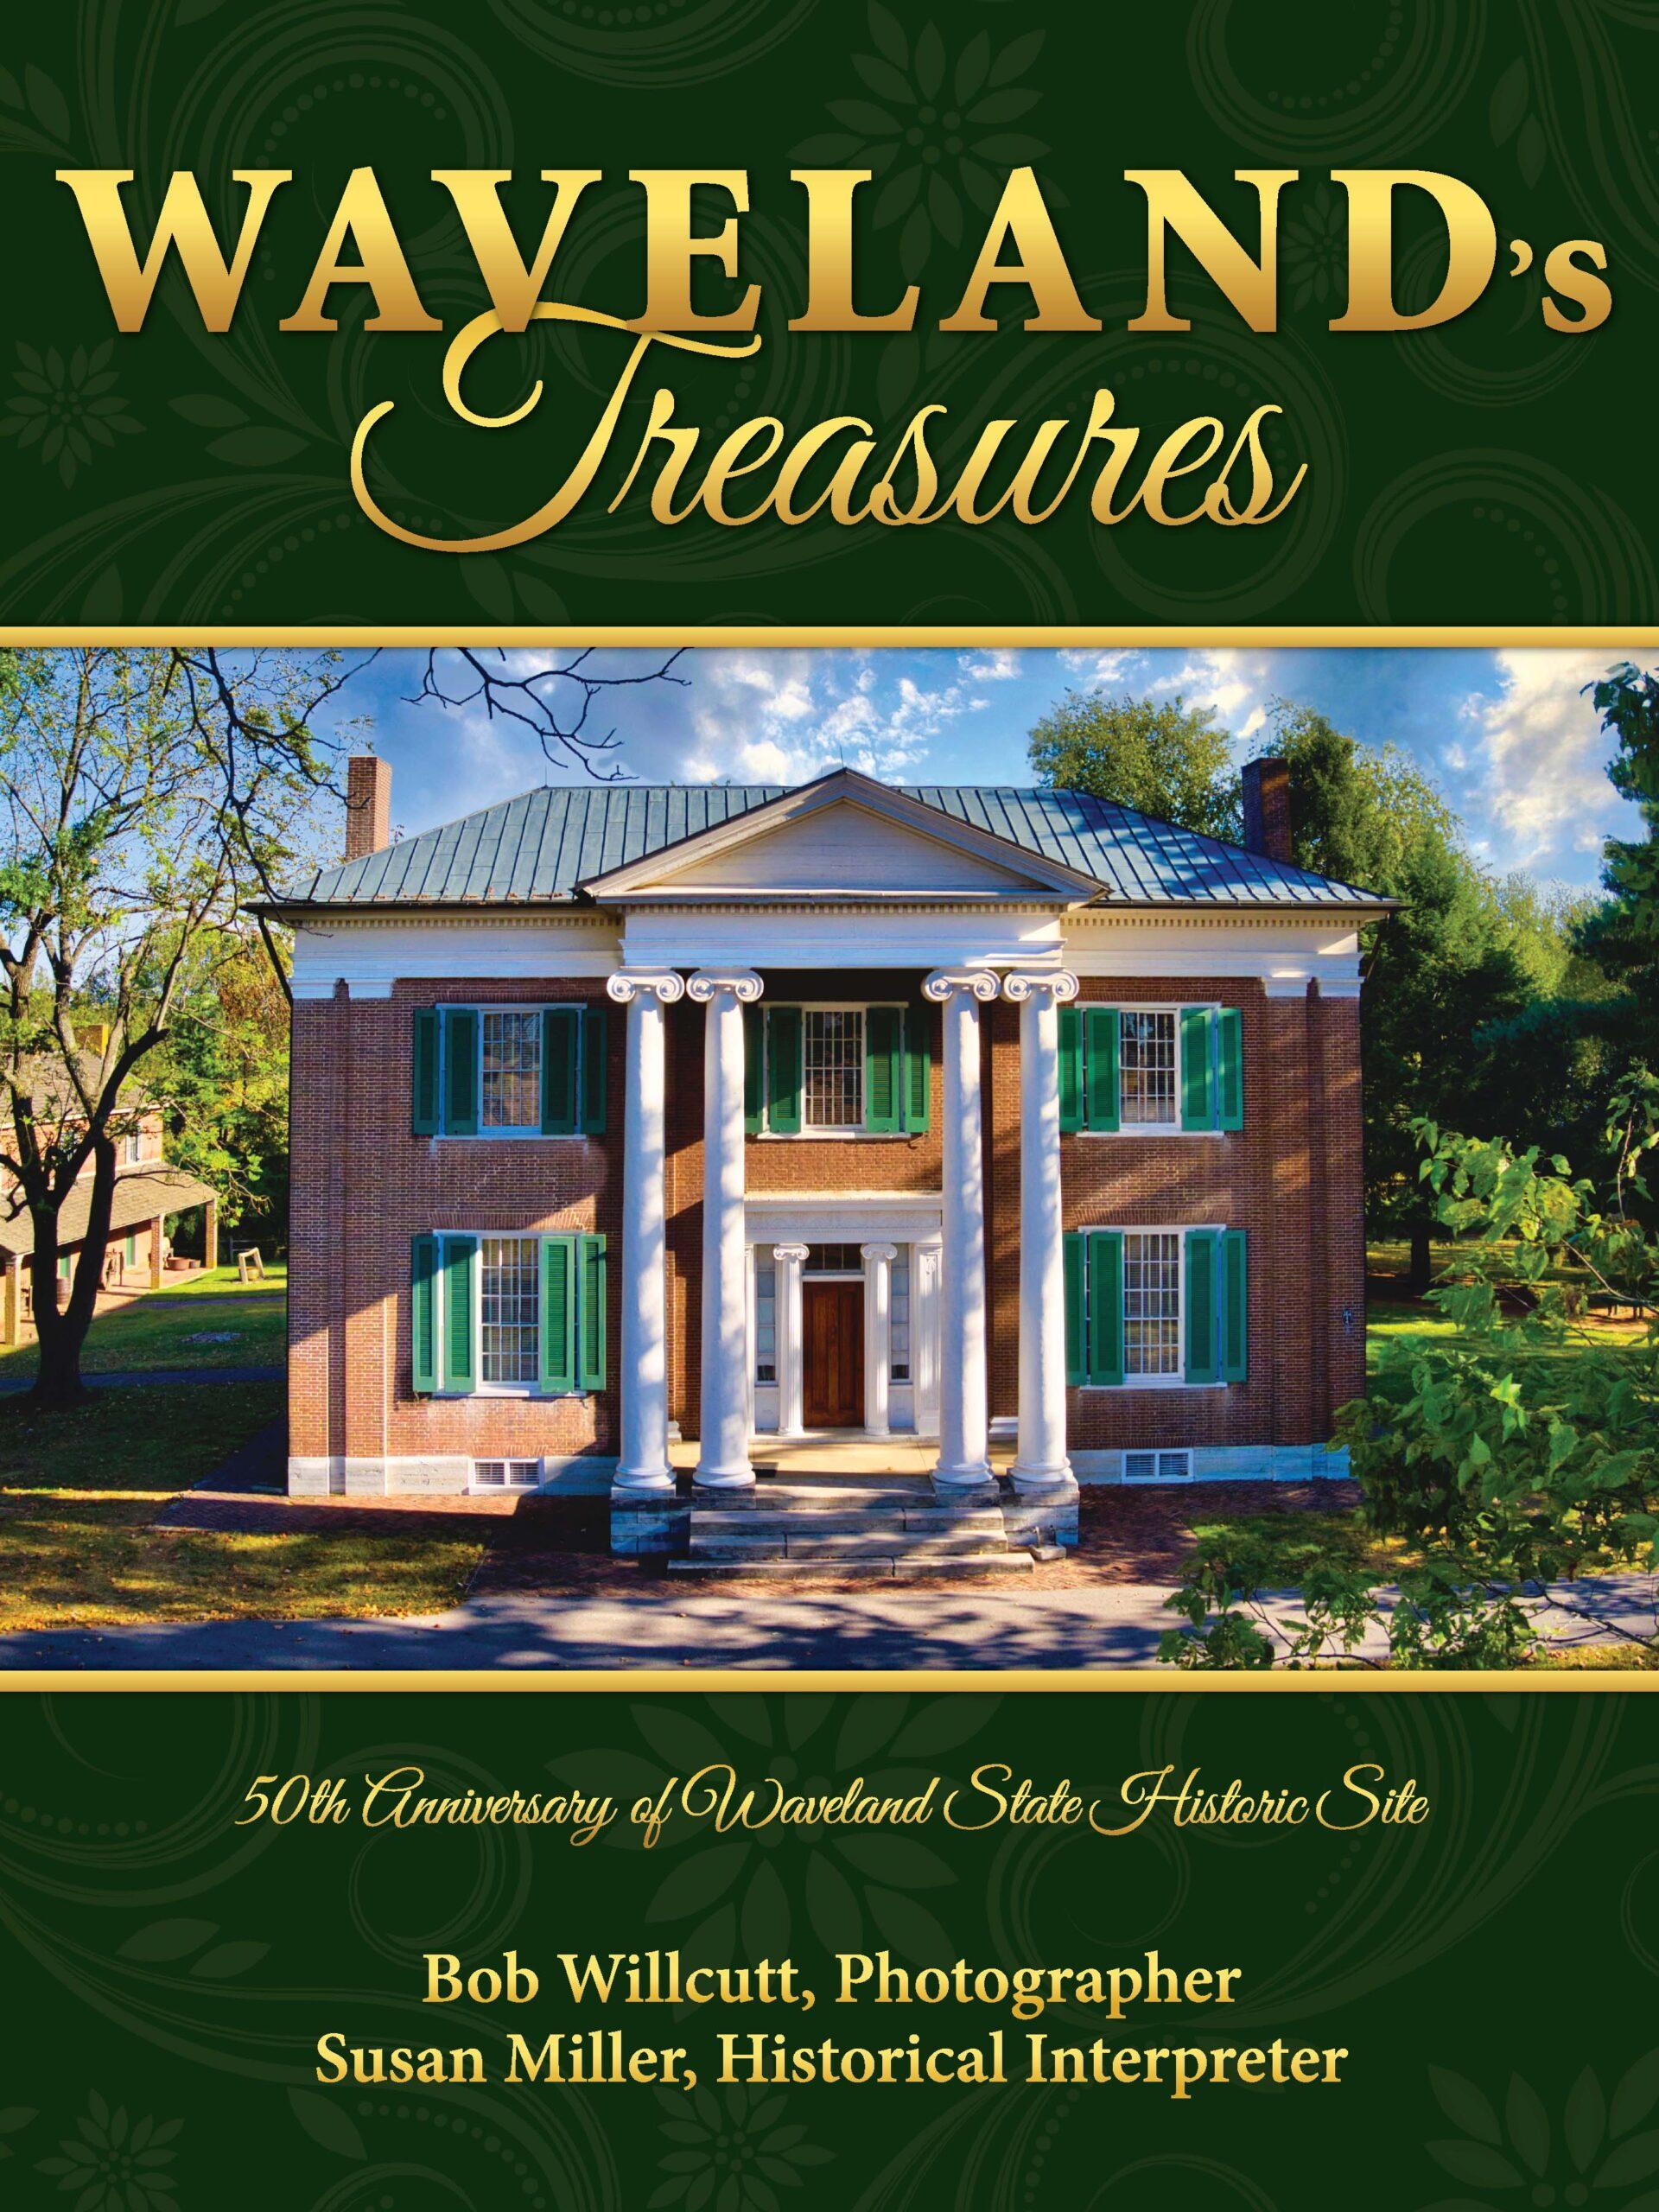 Waveland's Treasures: 50th Anniversary of Waveland State Historic Site